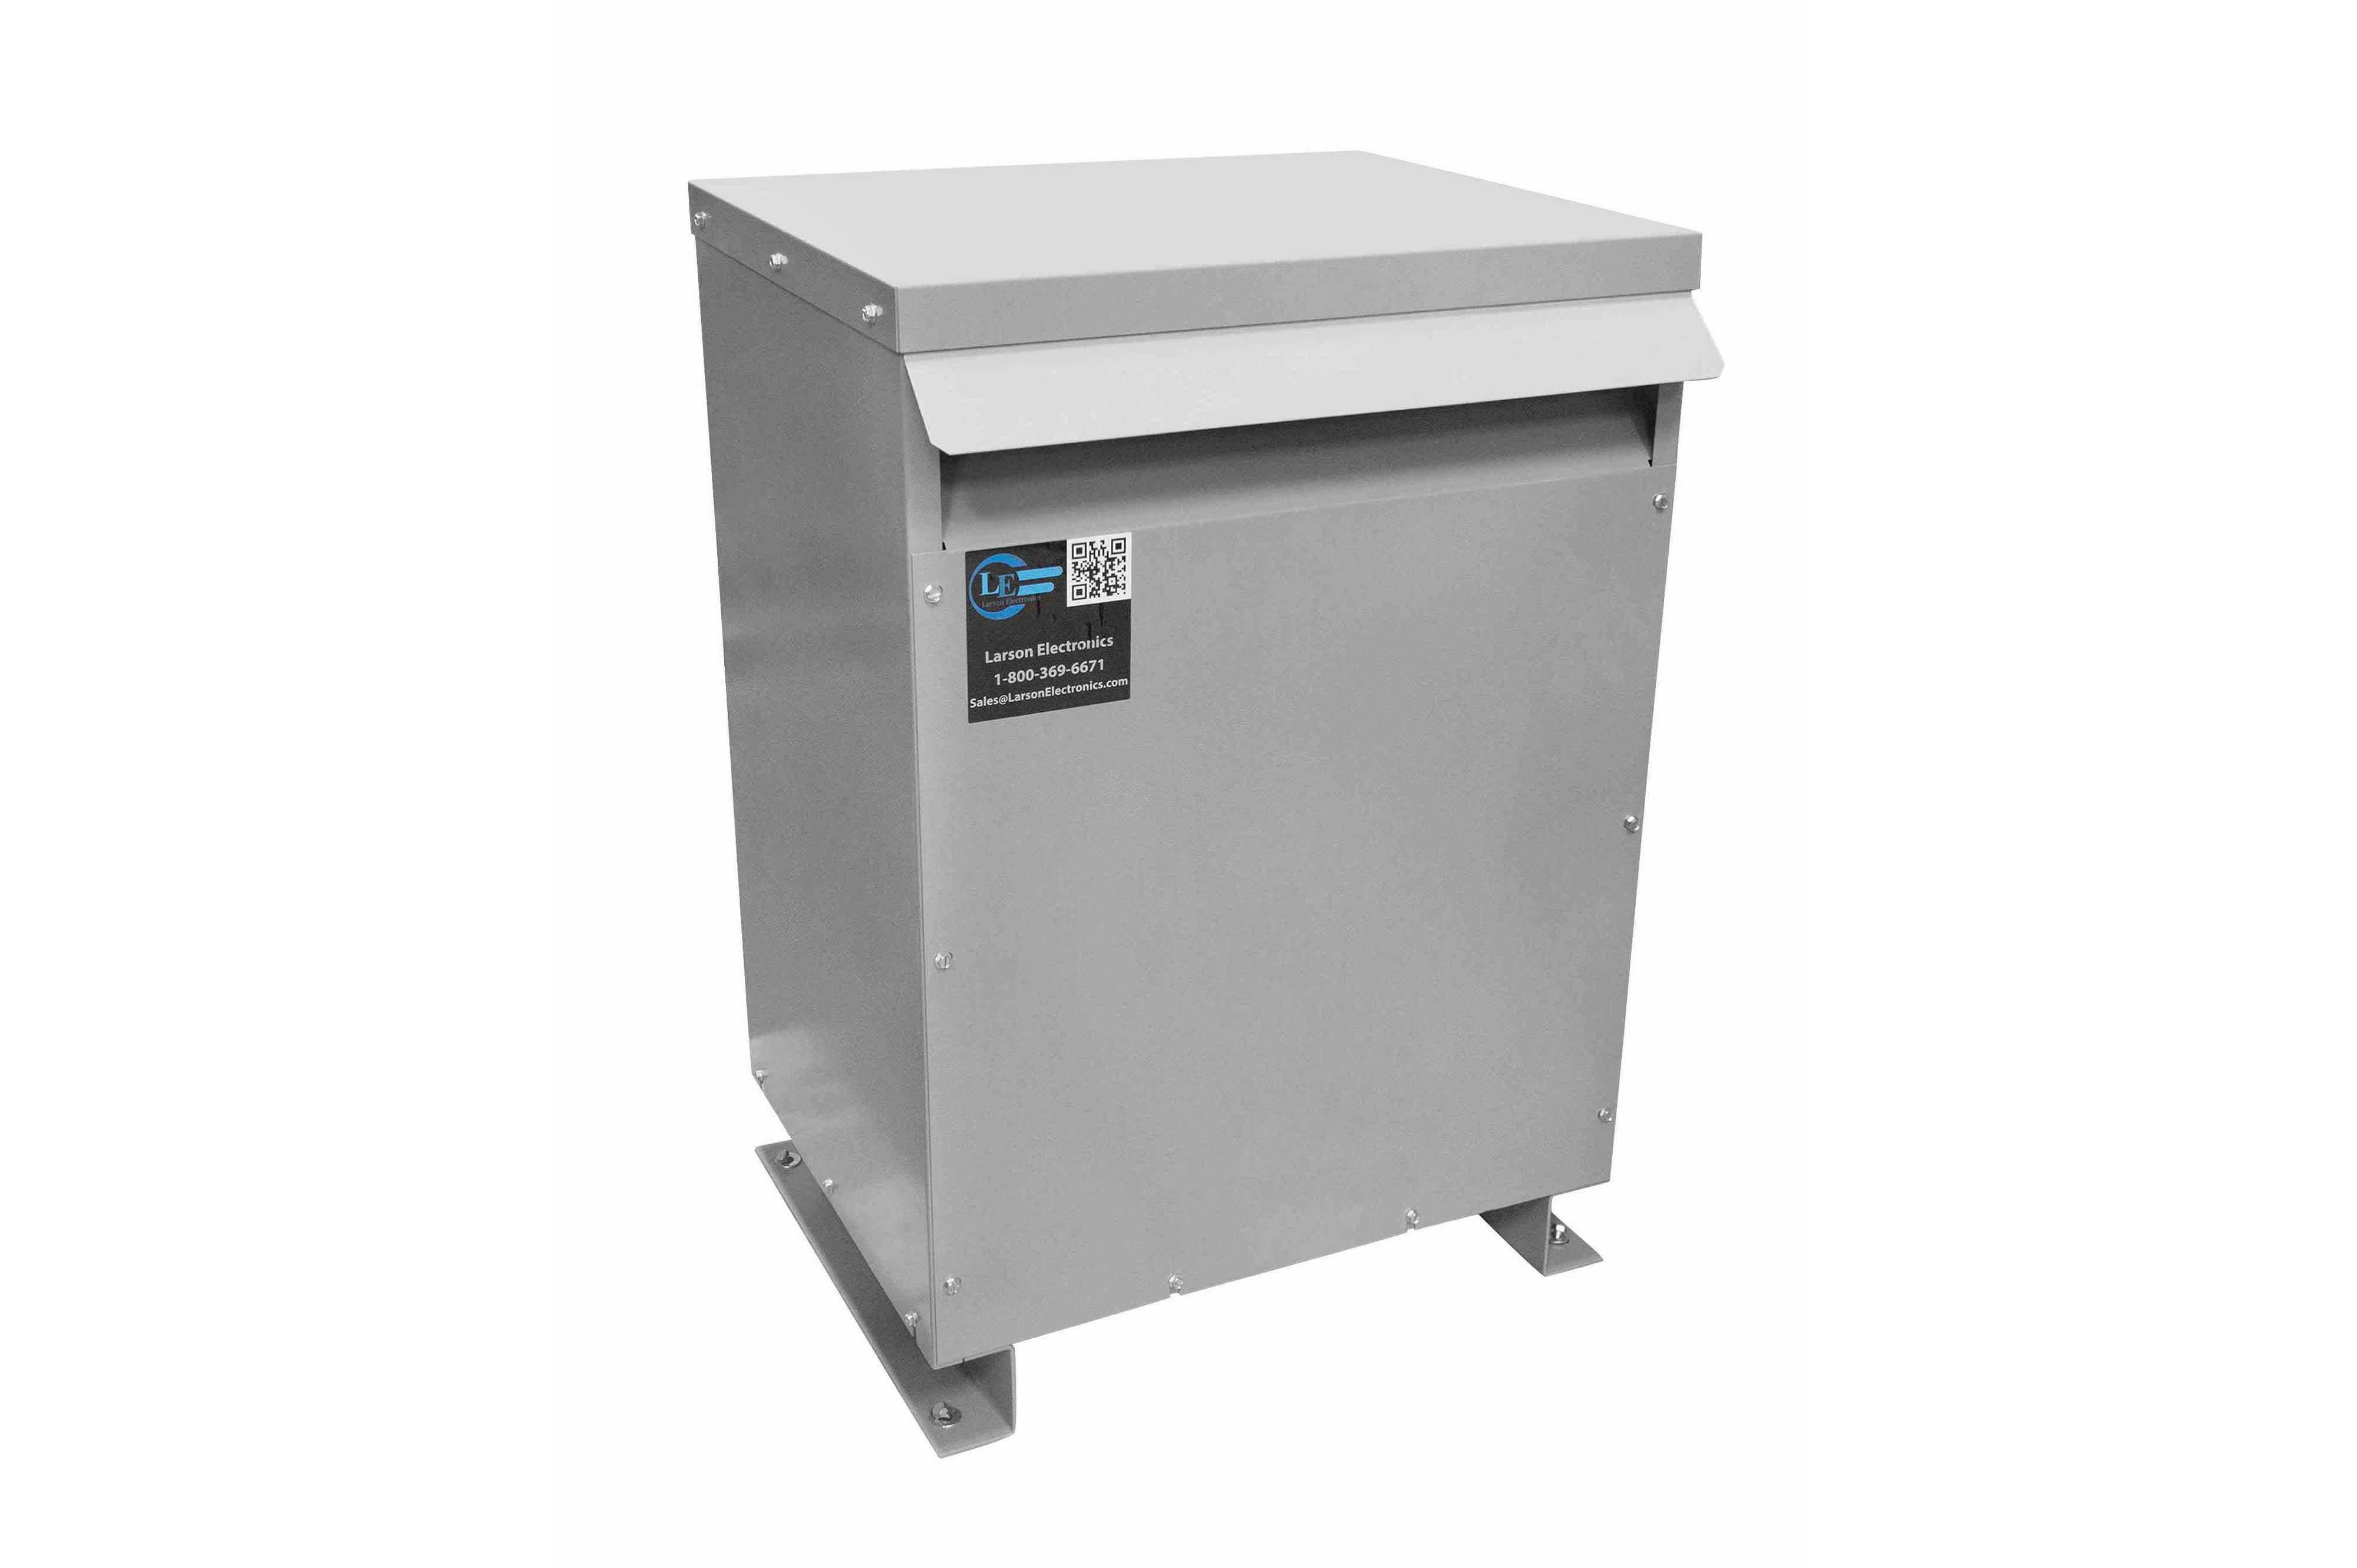 12 kVA 3PH DOE Transformer, 440V Delta Primary, 208Y/120 Wye-N Secondary, N3R, Ventilated, 60 Hz